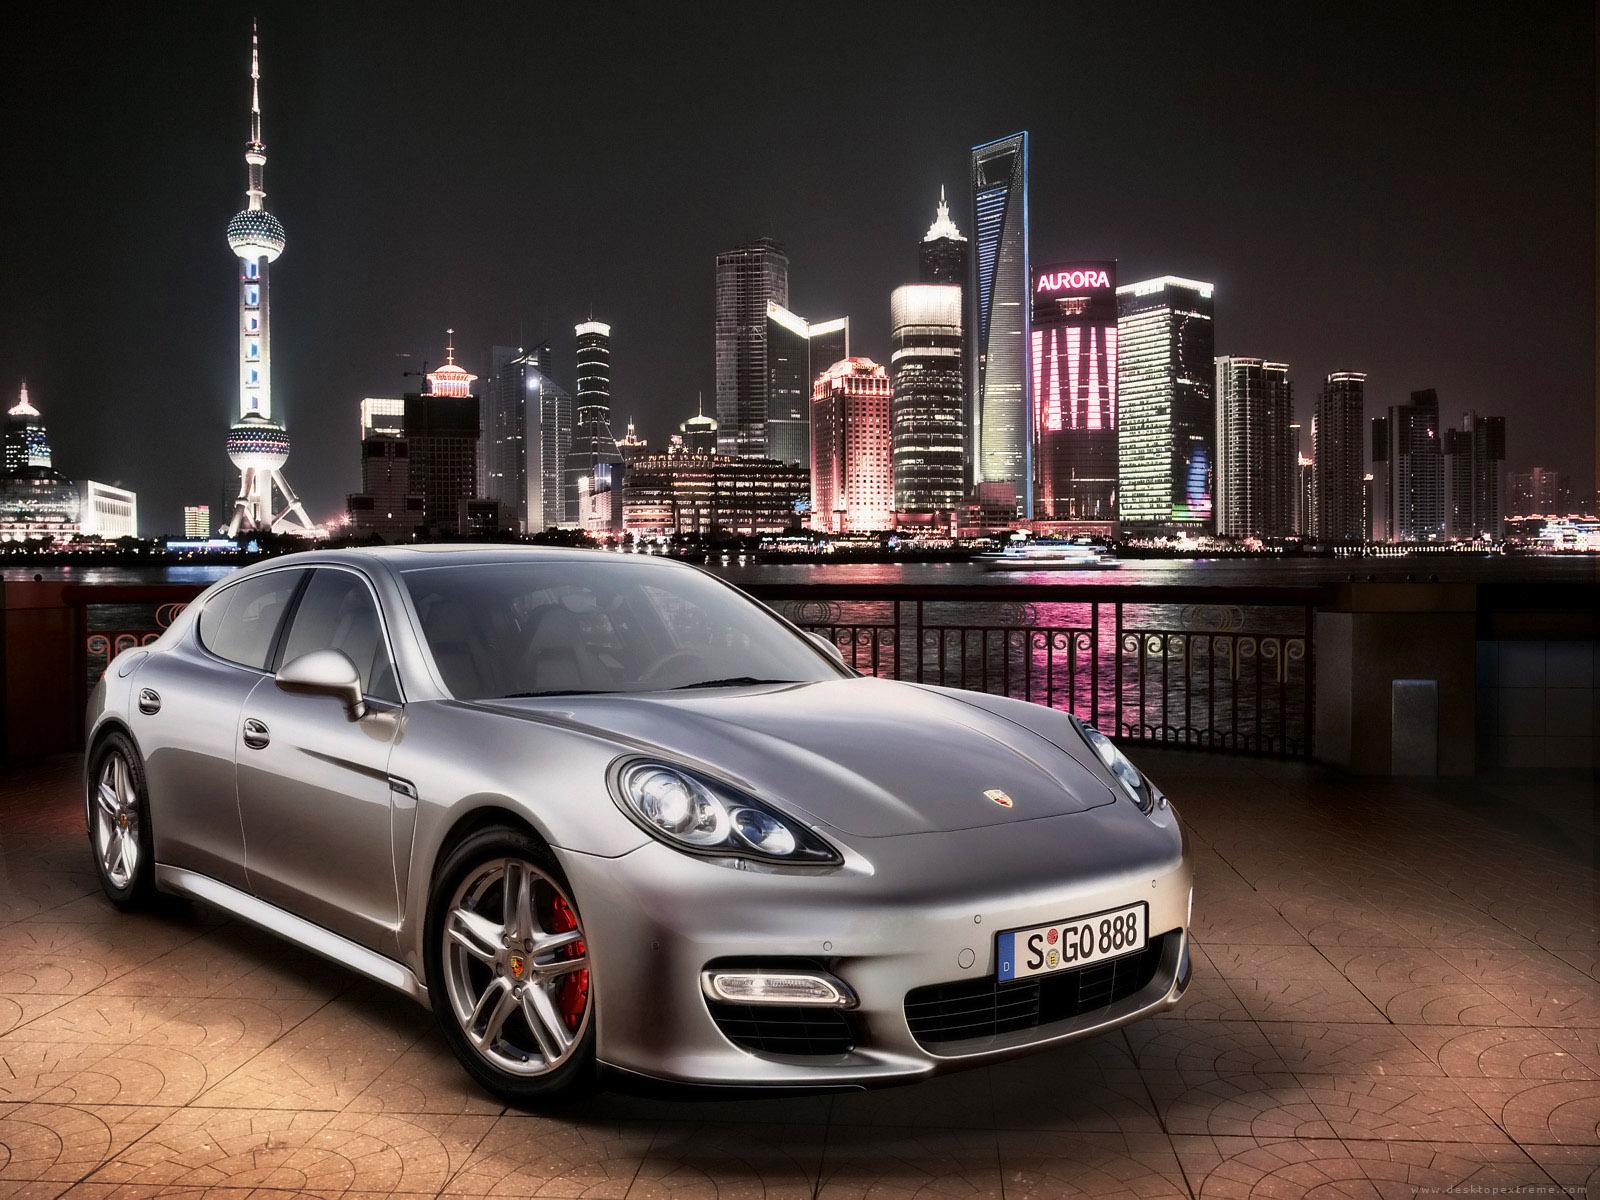 Porsche_Panamera_Turbo_58200940900PM501